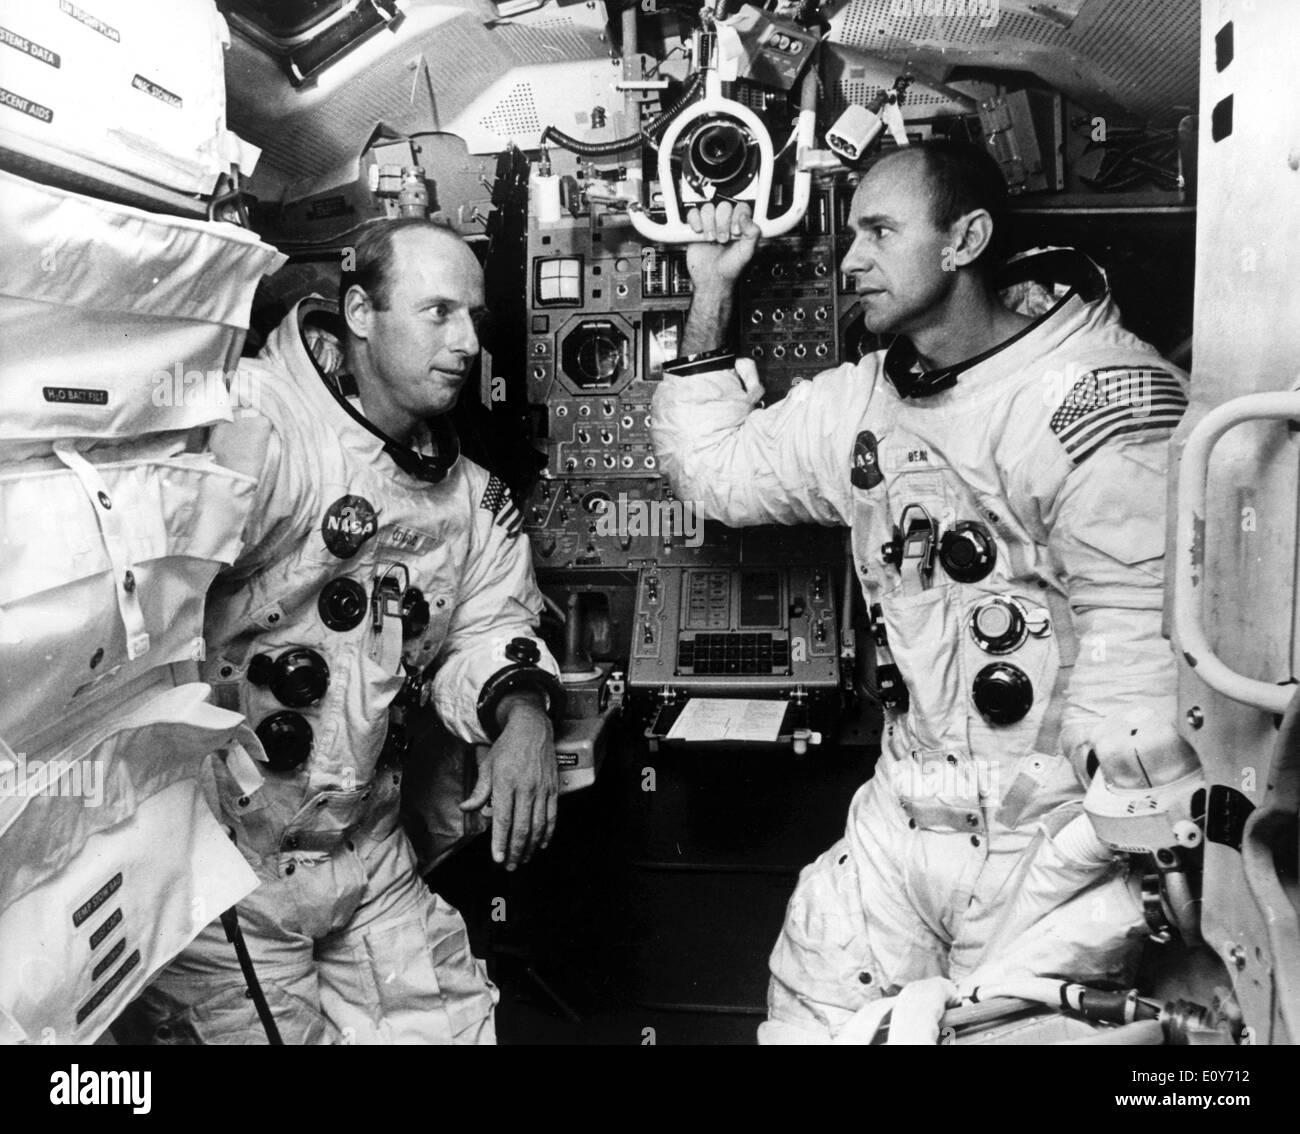 Apollo 12 Astronauts Pete Conrad and Alan Bean - Stock Image